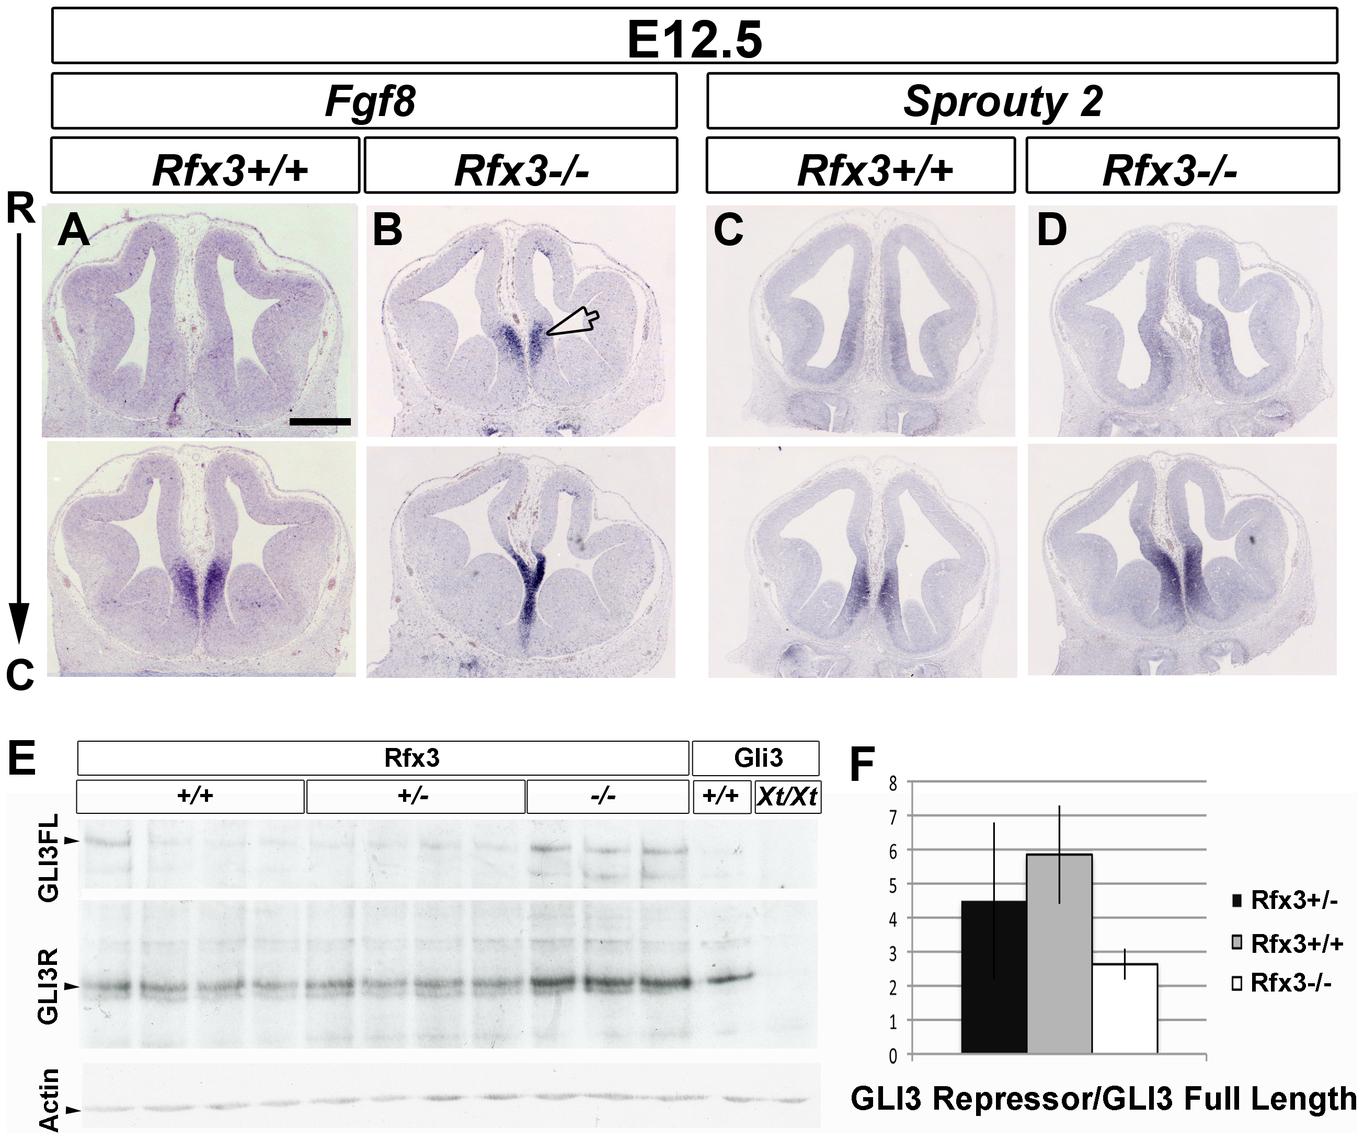 Disturbed expression of Fgf8 and of the ratio of GLI3 repressor/GLI3 activator forms in <i>Rfx3−/−</i> CSB.